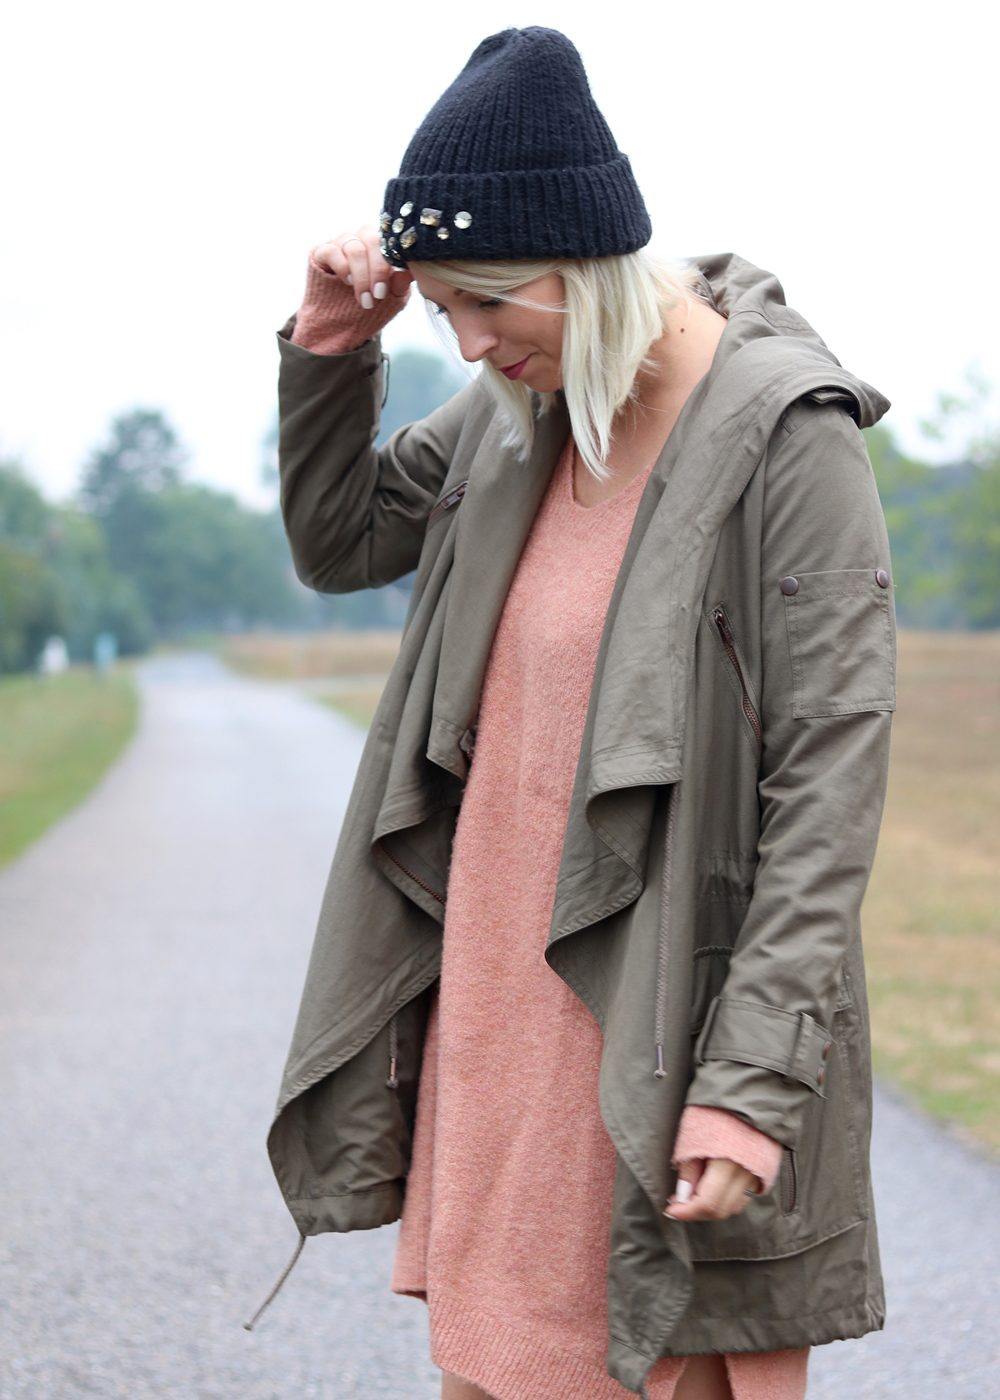 Fashionblogger Outfit Gummistiefel Ilse Jacobsen Strickkleid rosa Parka khaki Oversize Beanie mit Glitzersteinen (7)